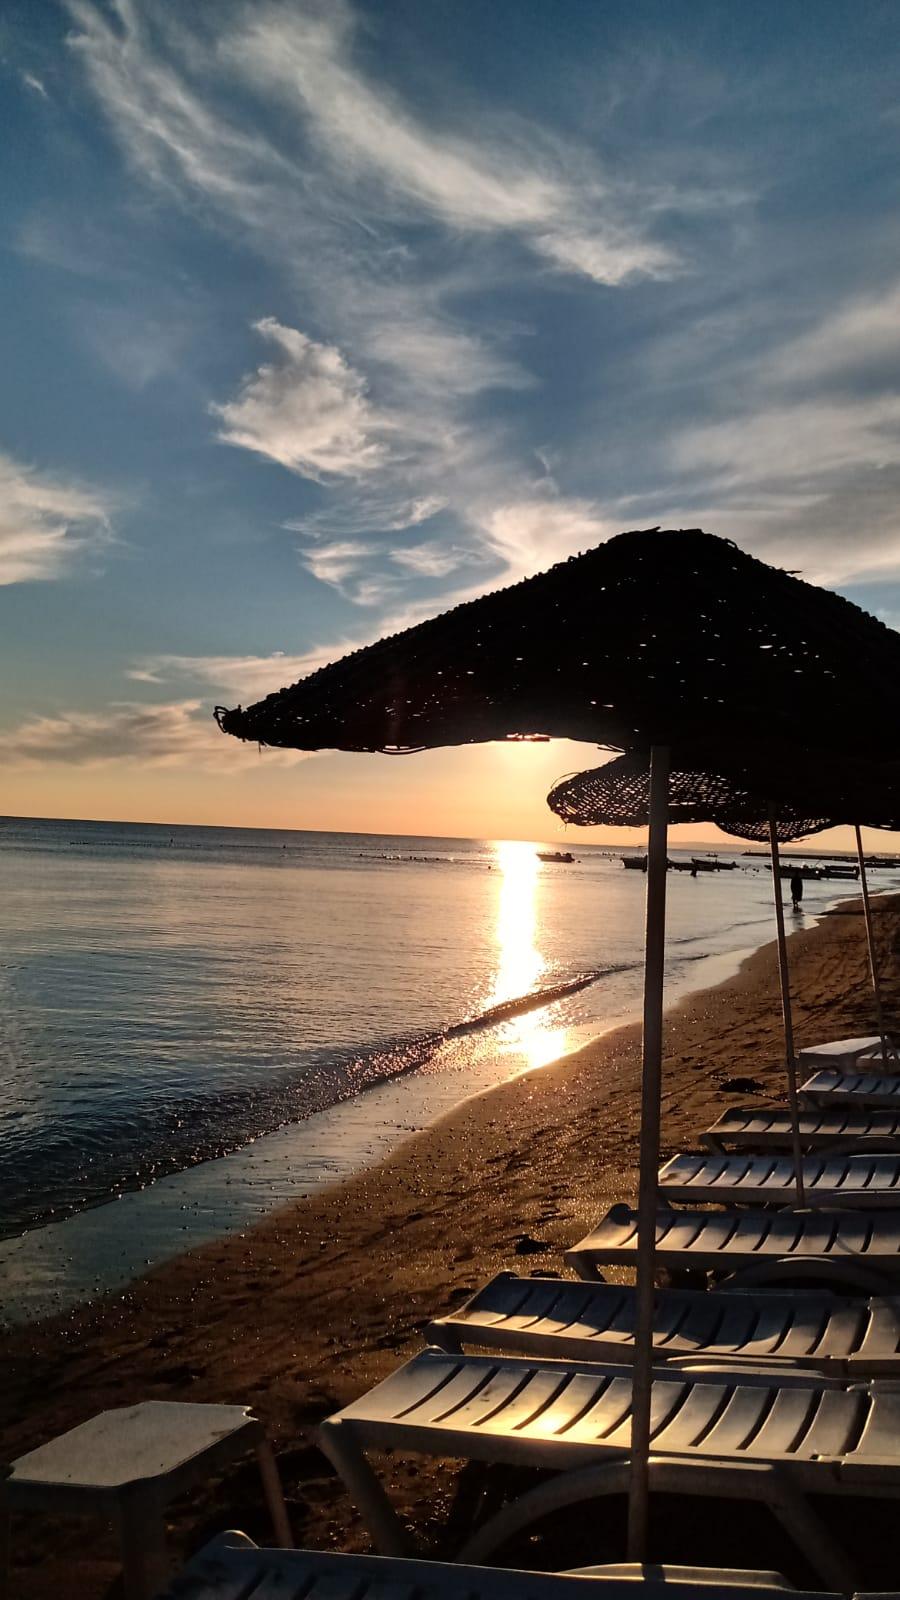 Letovanje Turska avionom, Kumburgaz, hotel Blue World, plaža